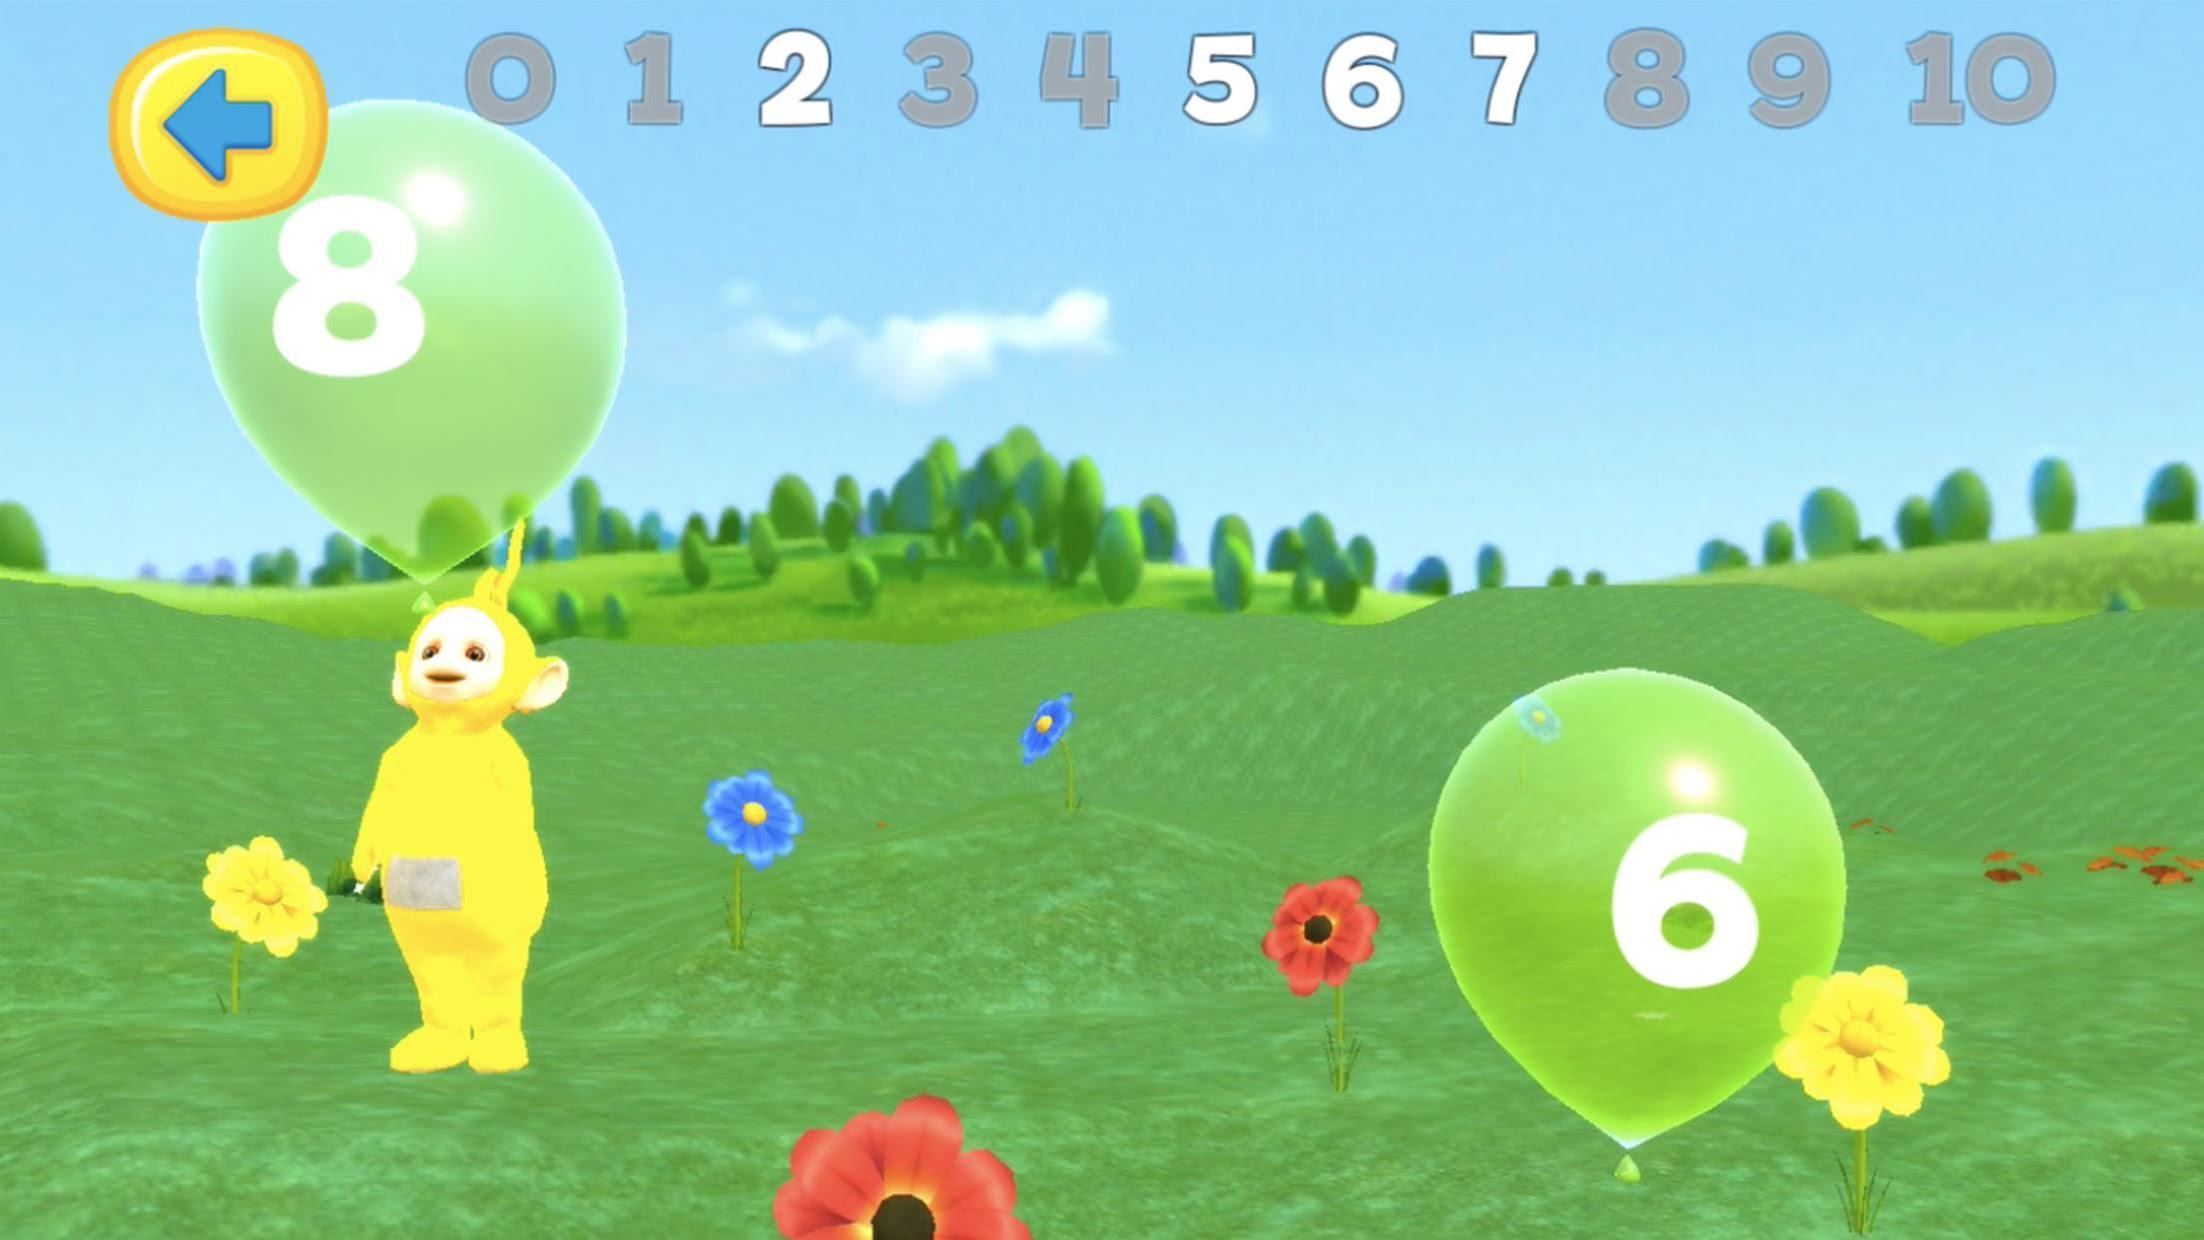 Teletubbies Balloon Pop Game For Kids 游戏截图3